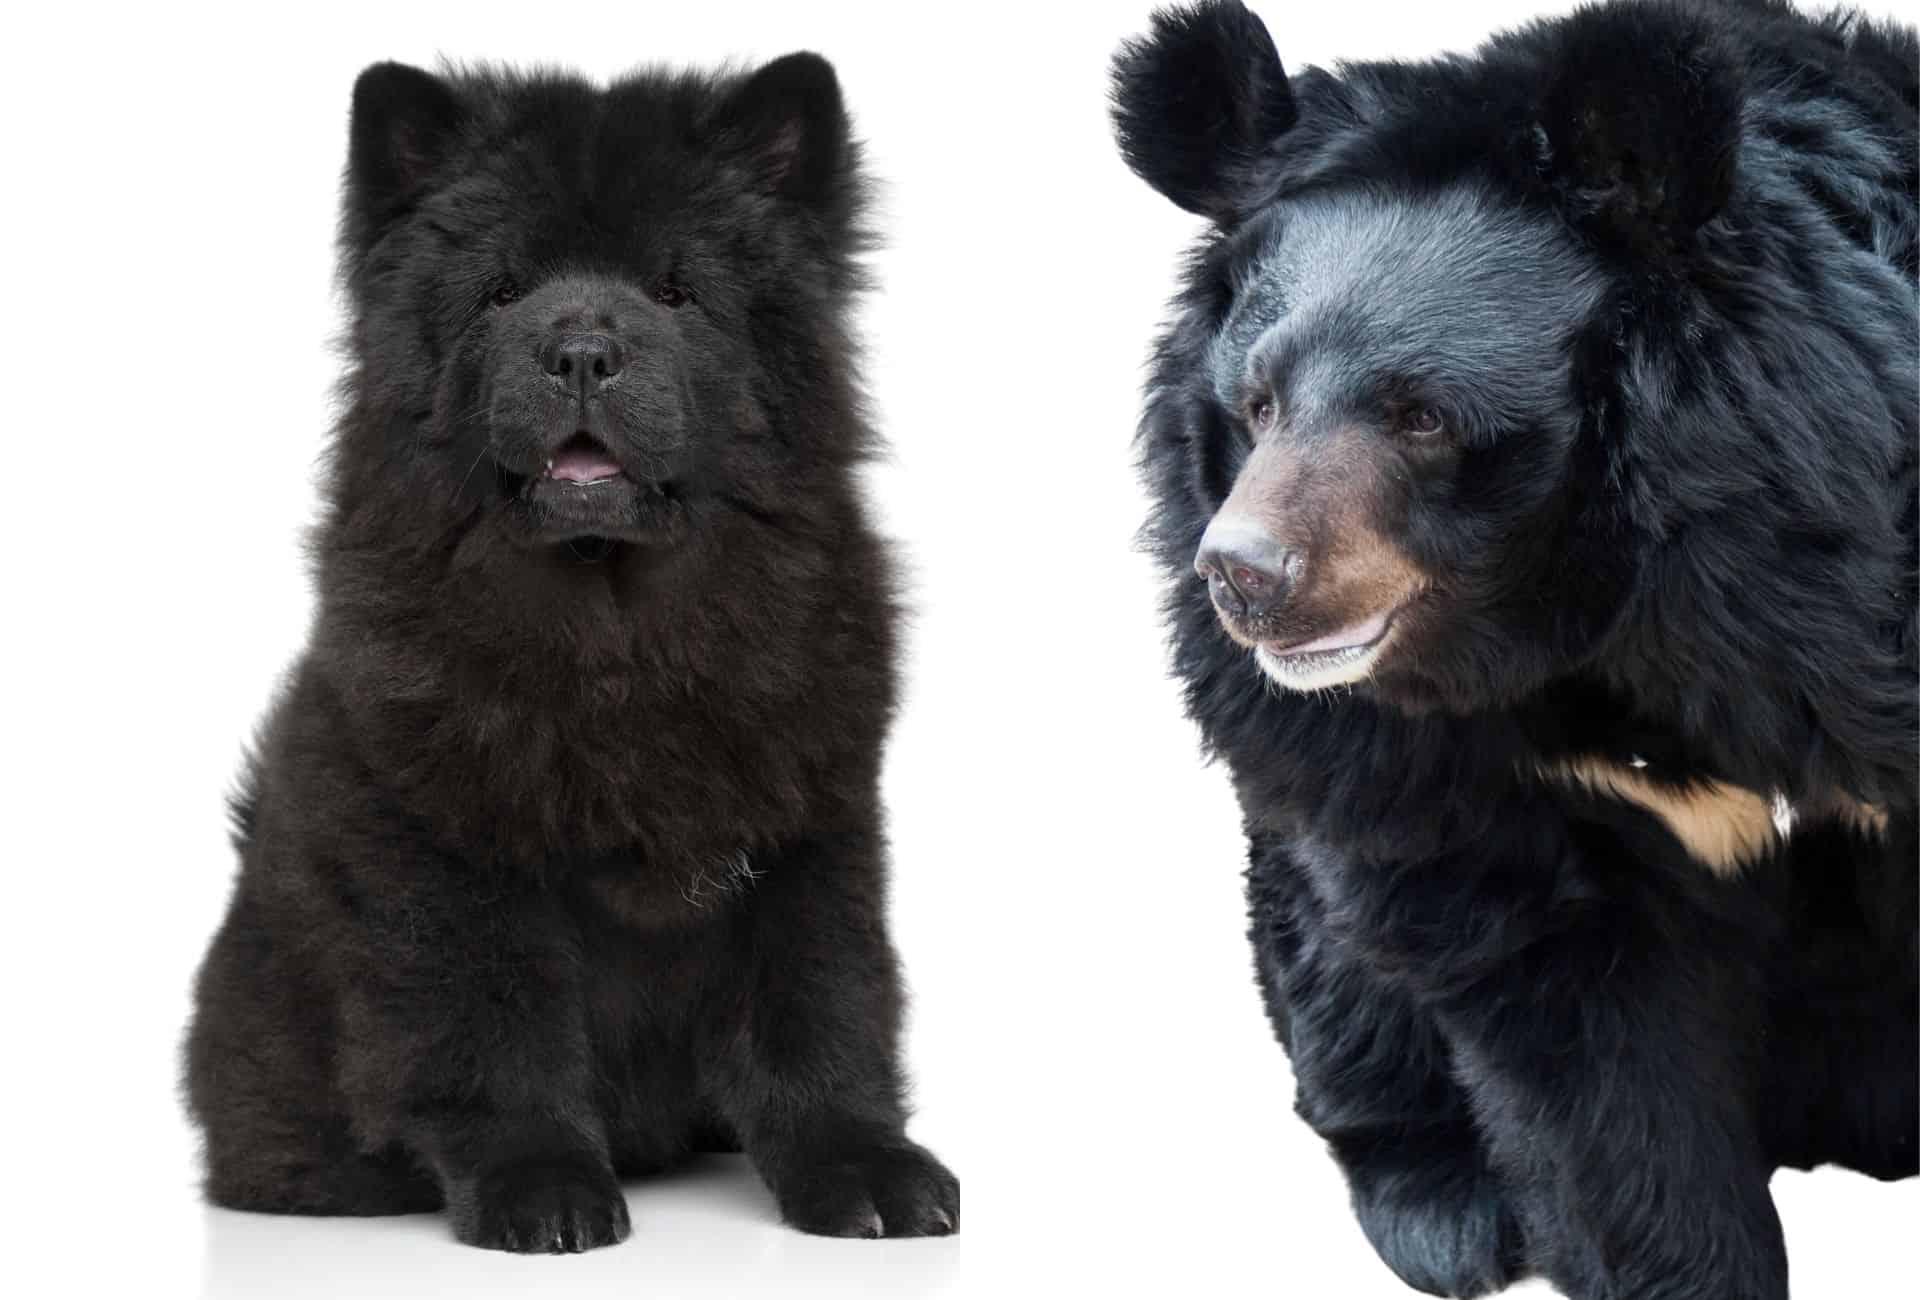 Black Chow Chow puppy next to a black Asian bear.